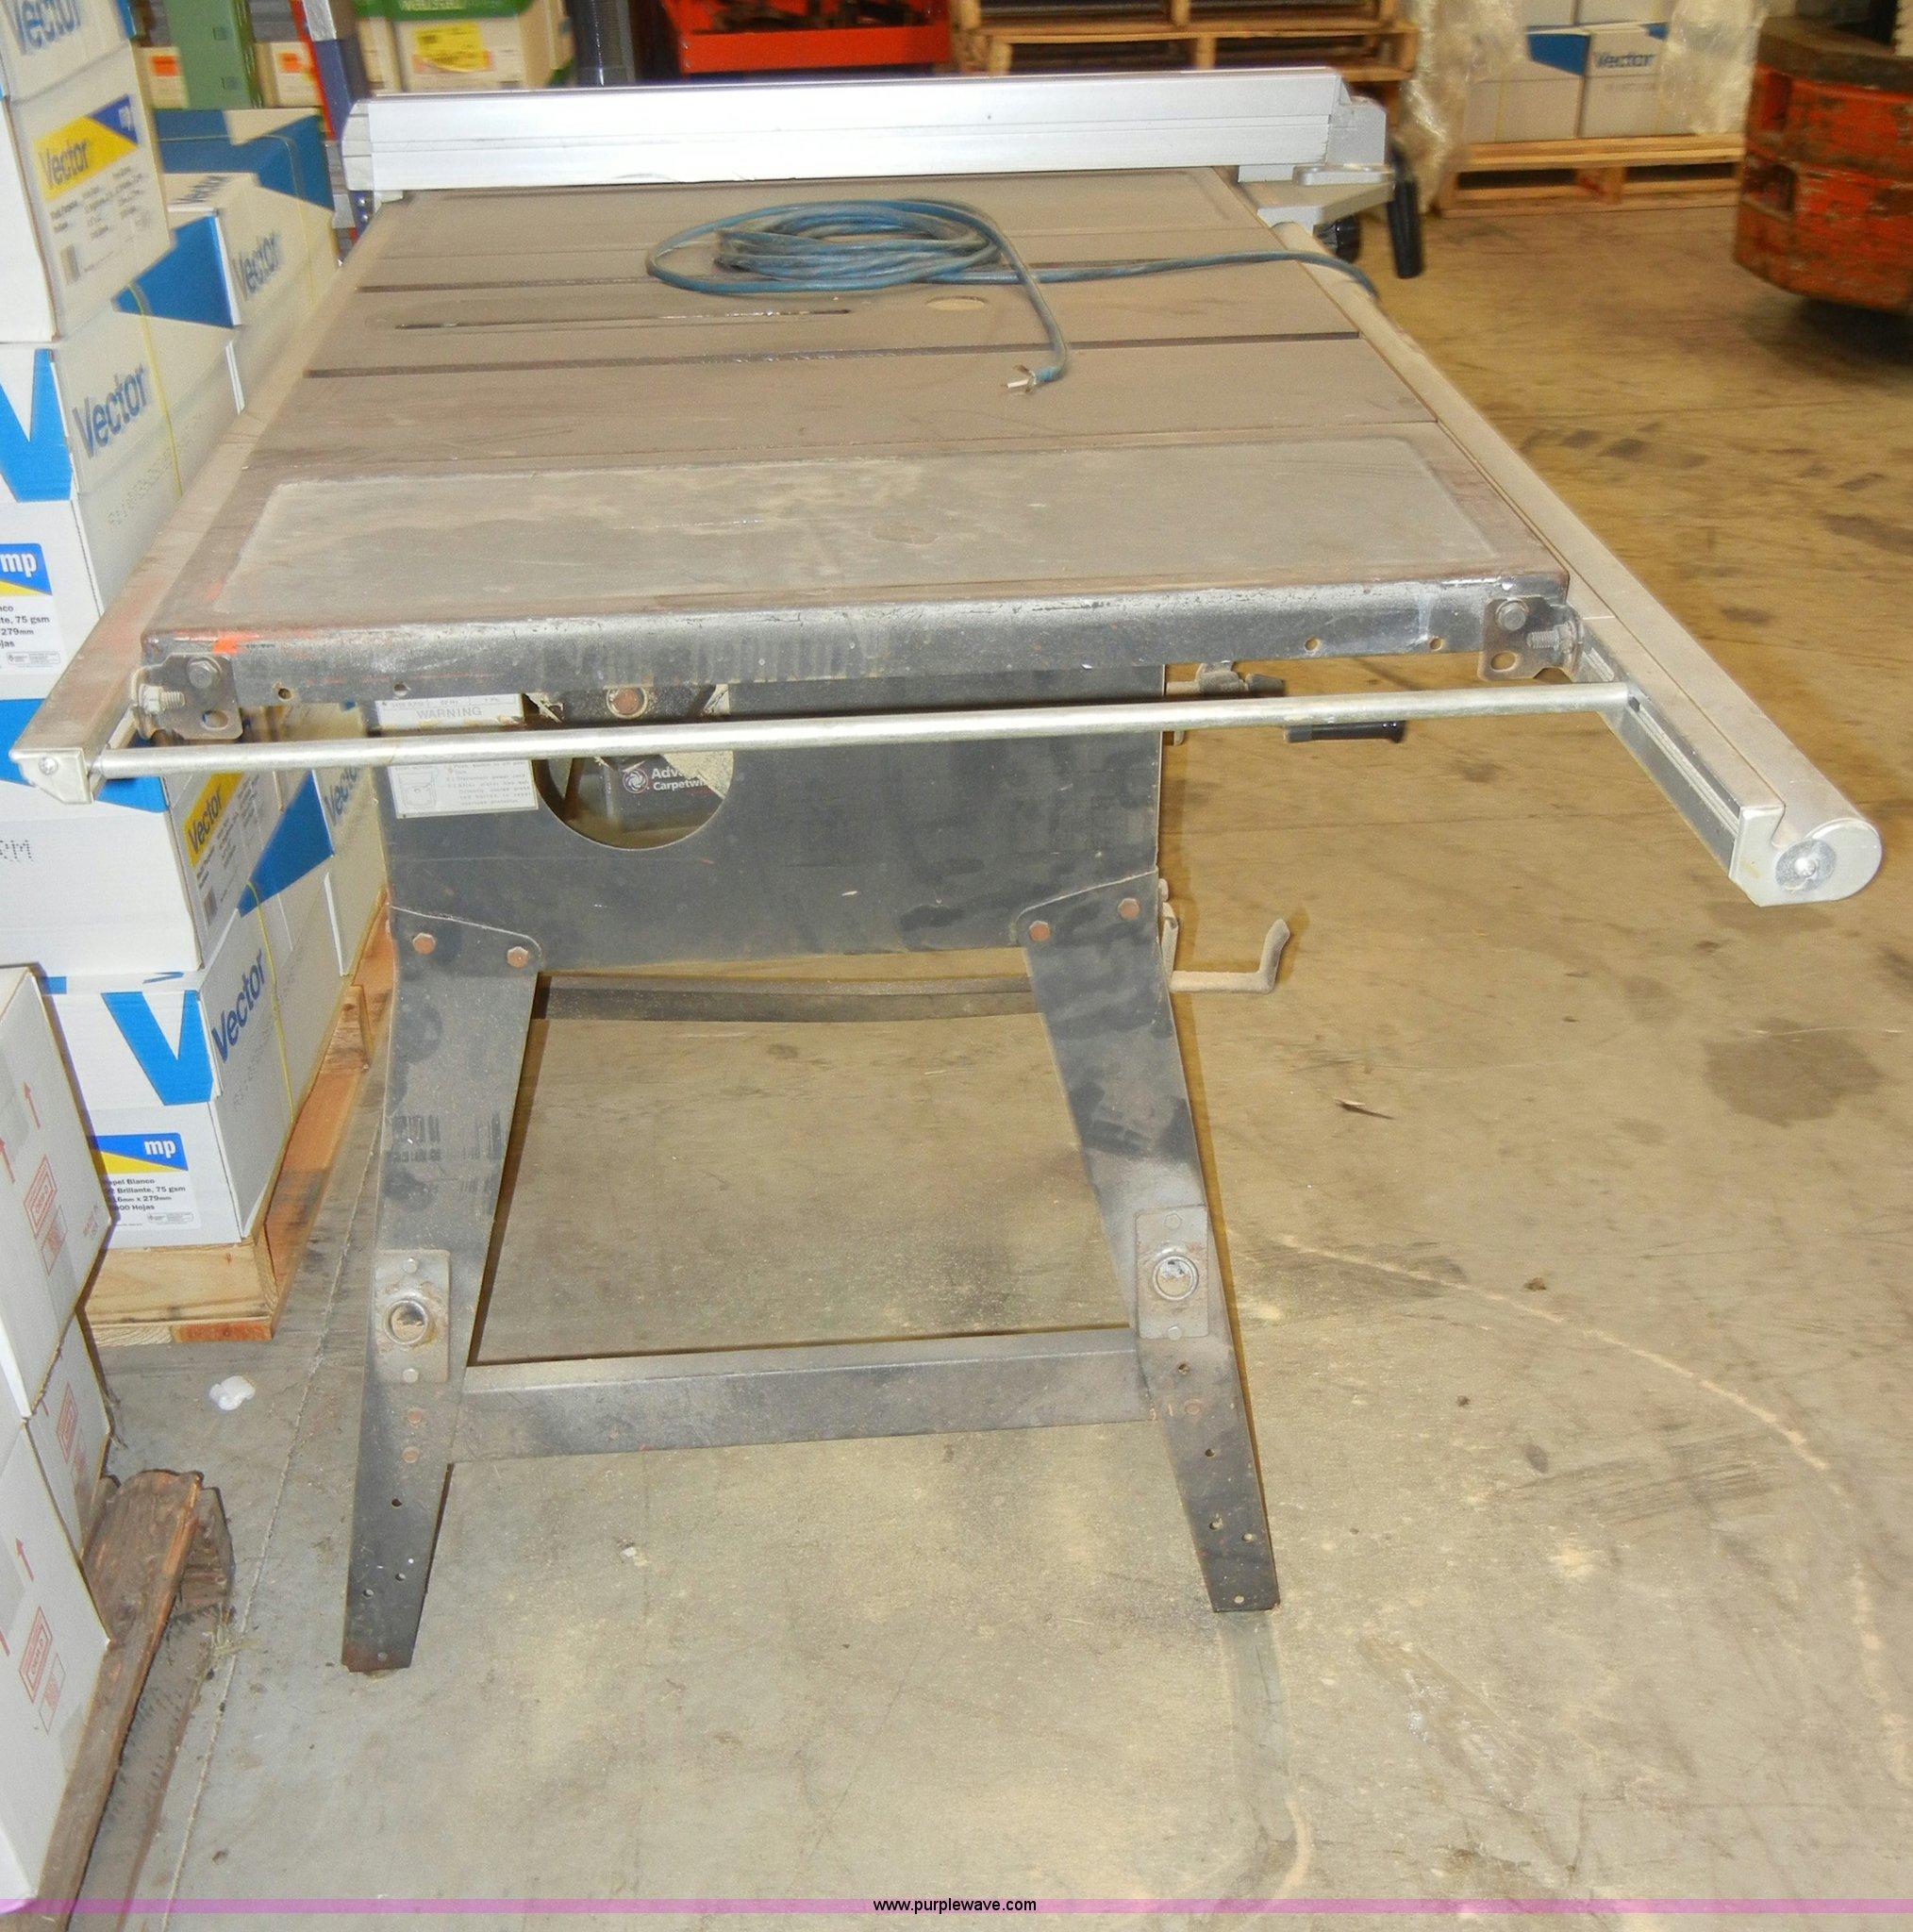 Craftsman Xr2424 12 Table Saw Item H9184 Sold Jan